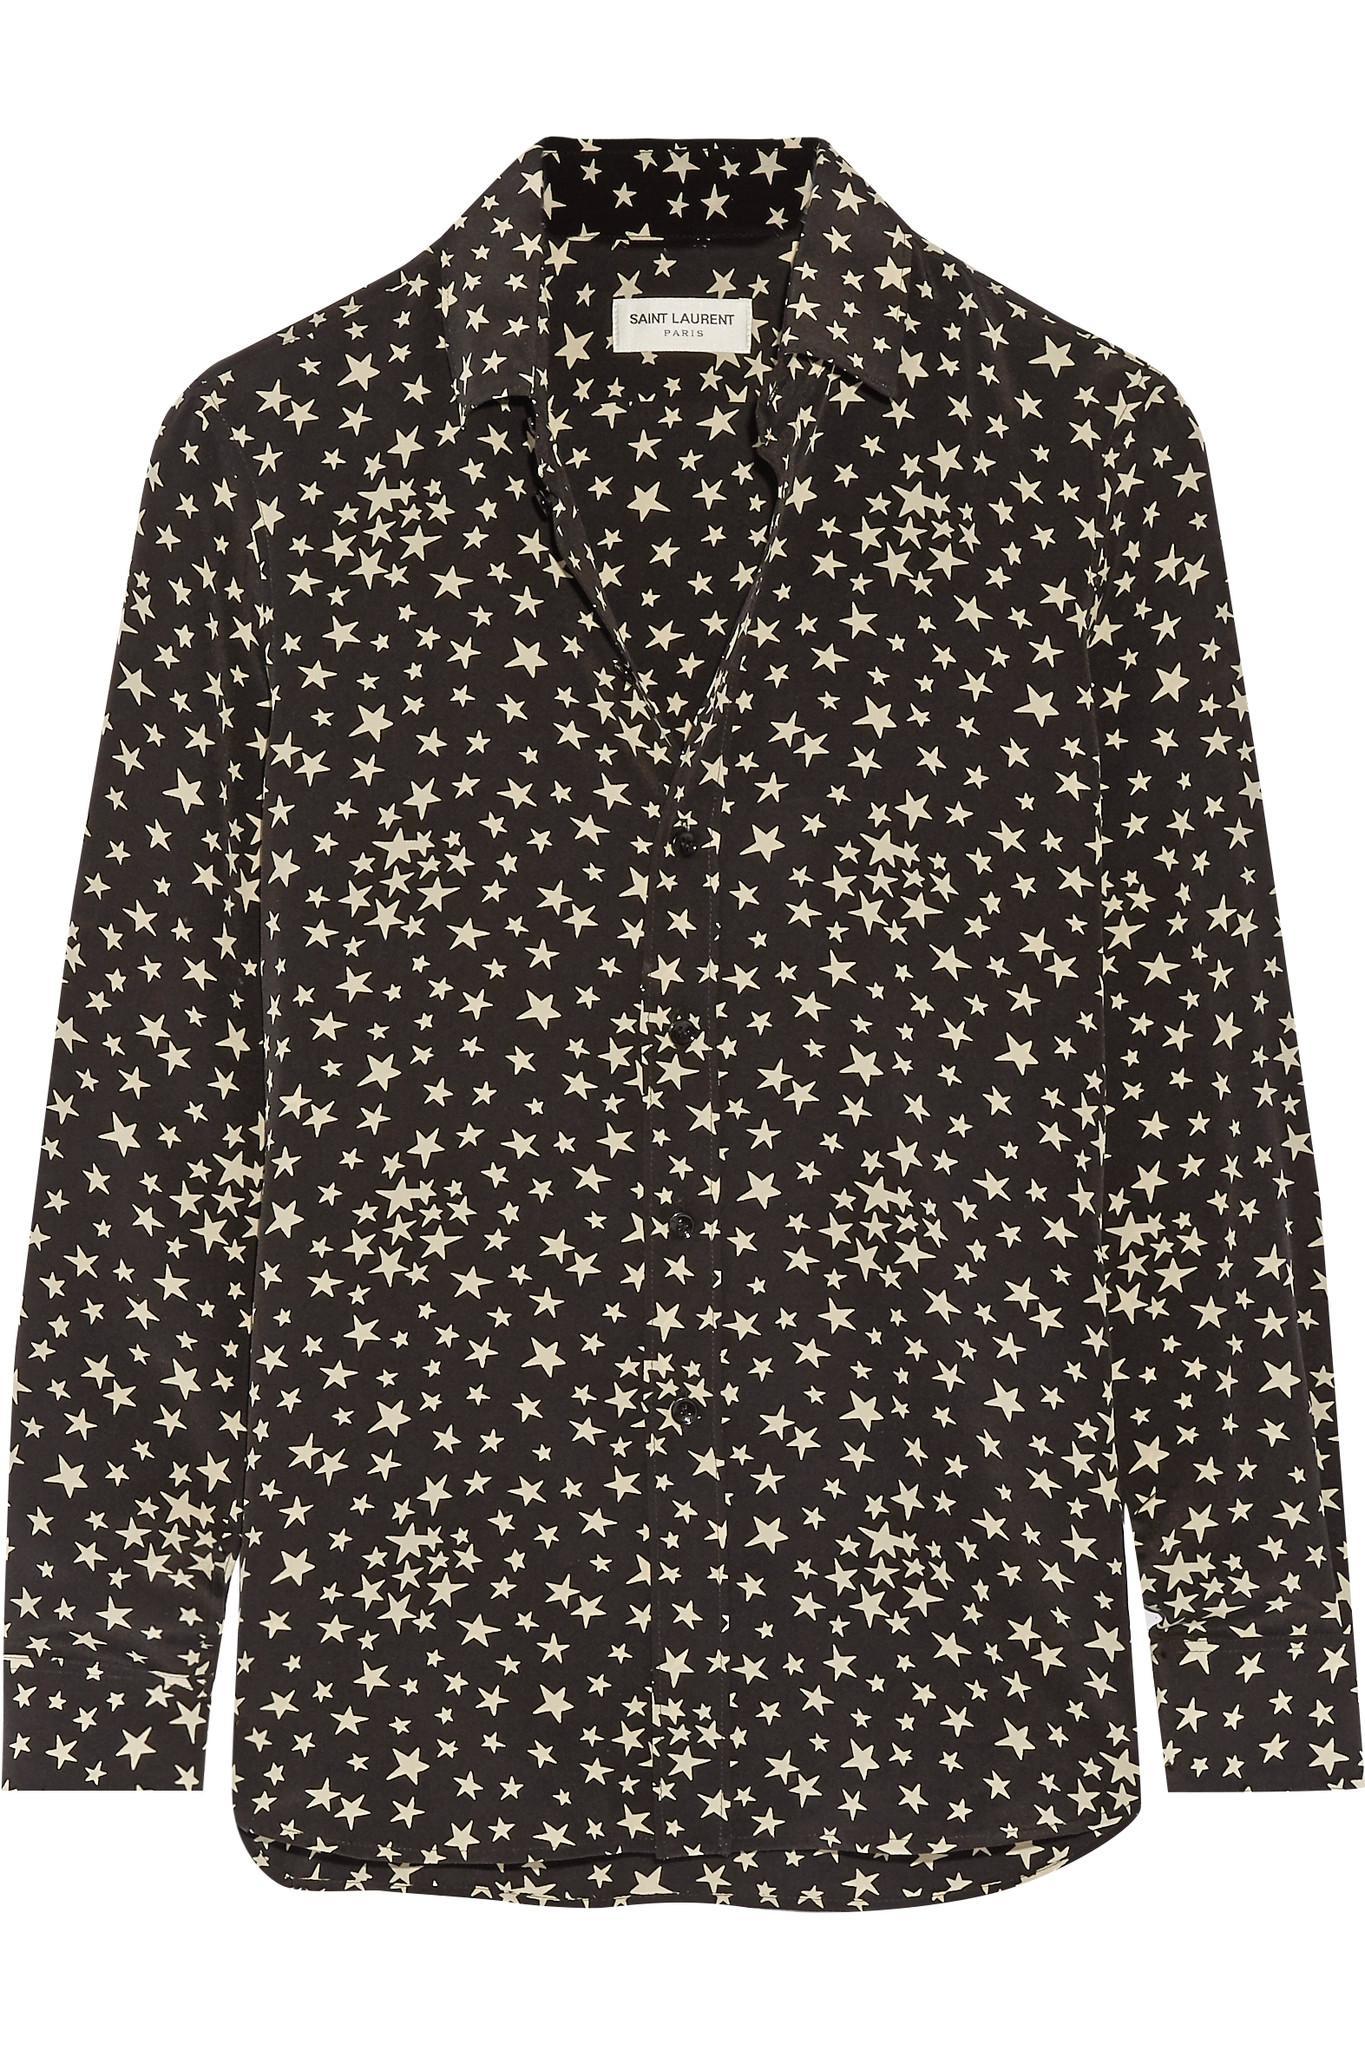 Lyst saint laurent printed silk crepe de chine shirt in for Saint laurent shirt womens